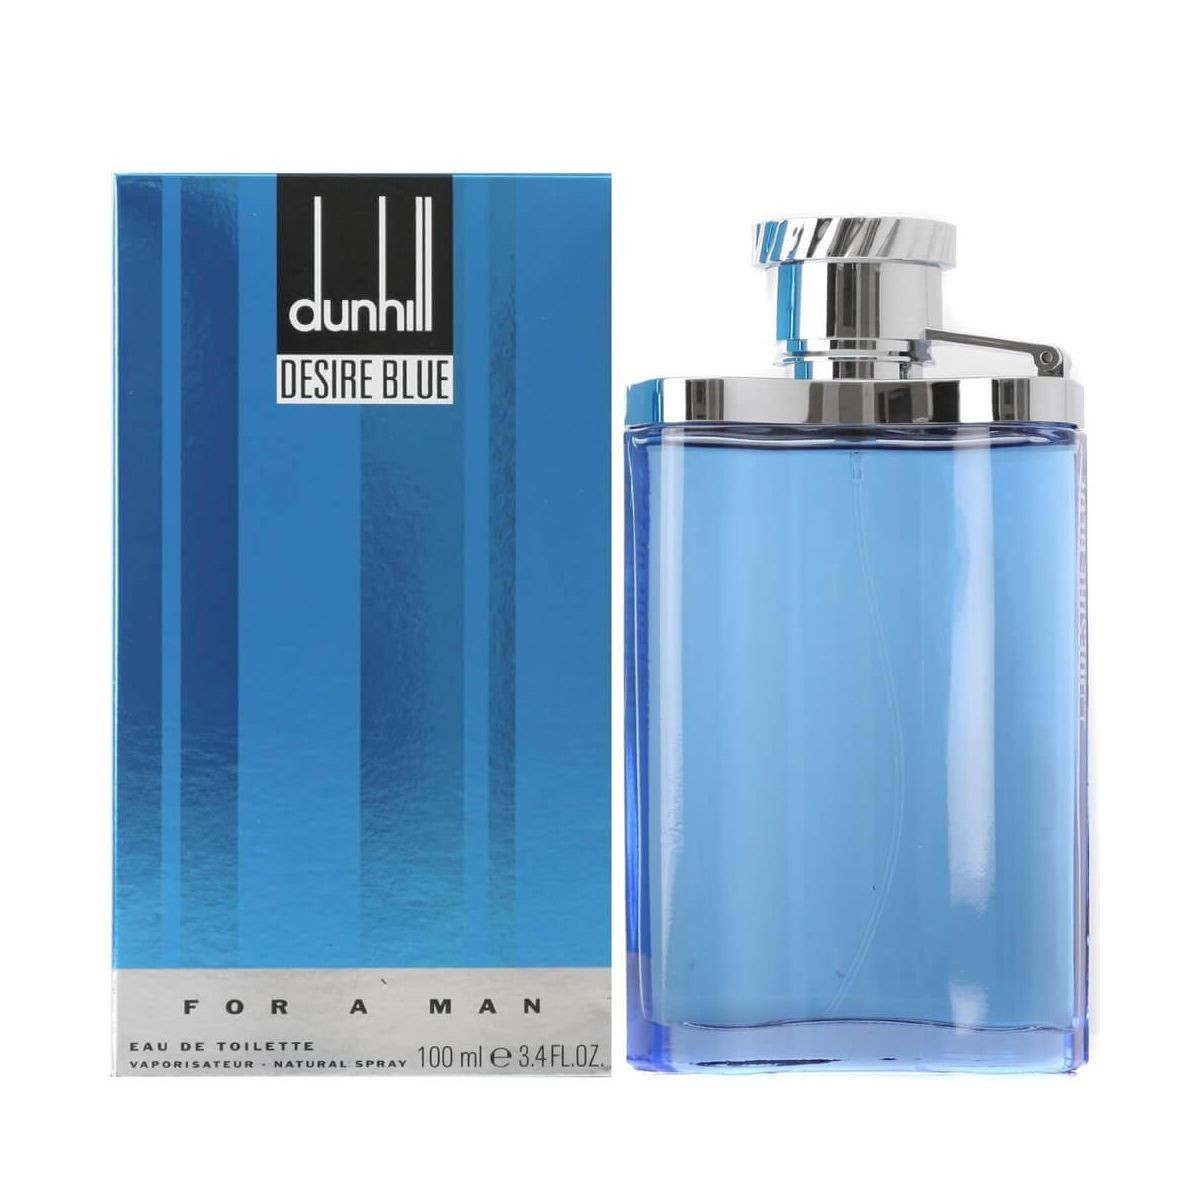 Аромат направления DESIRE BLUE (DUNHILL) PP 10-44